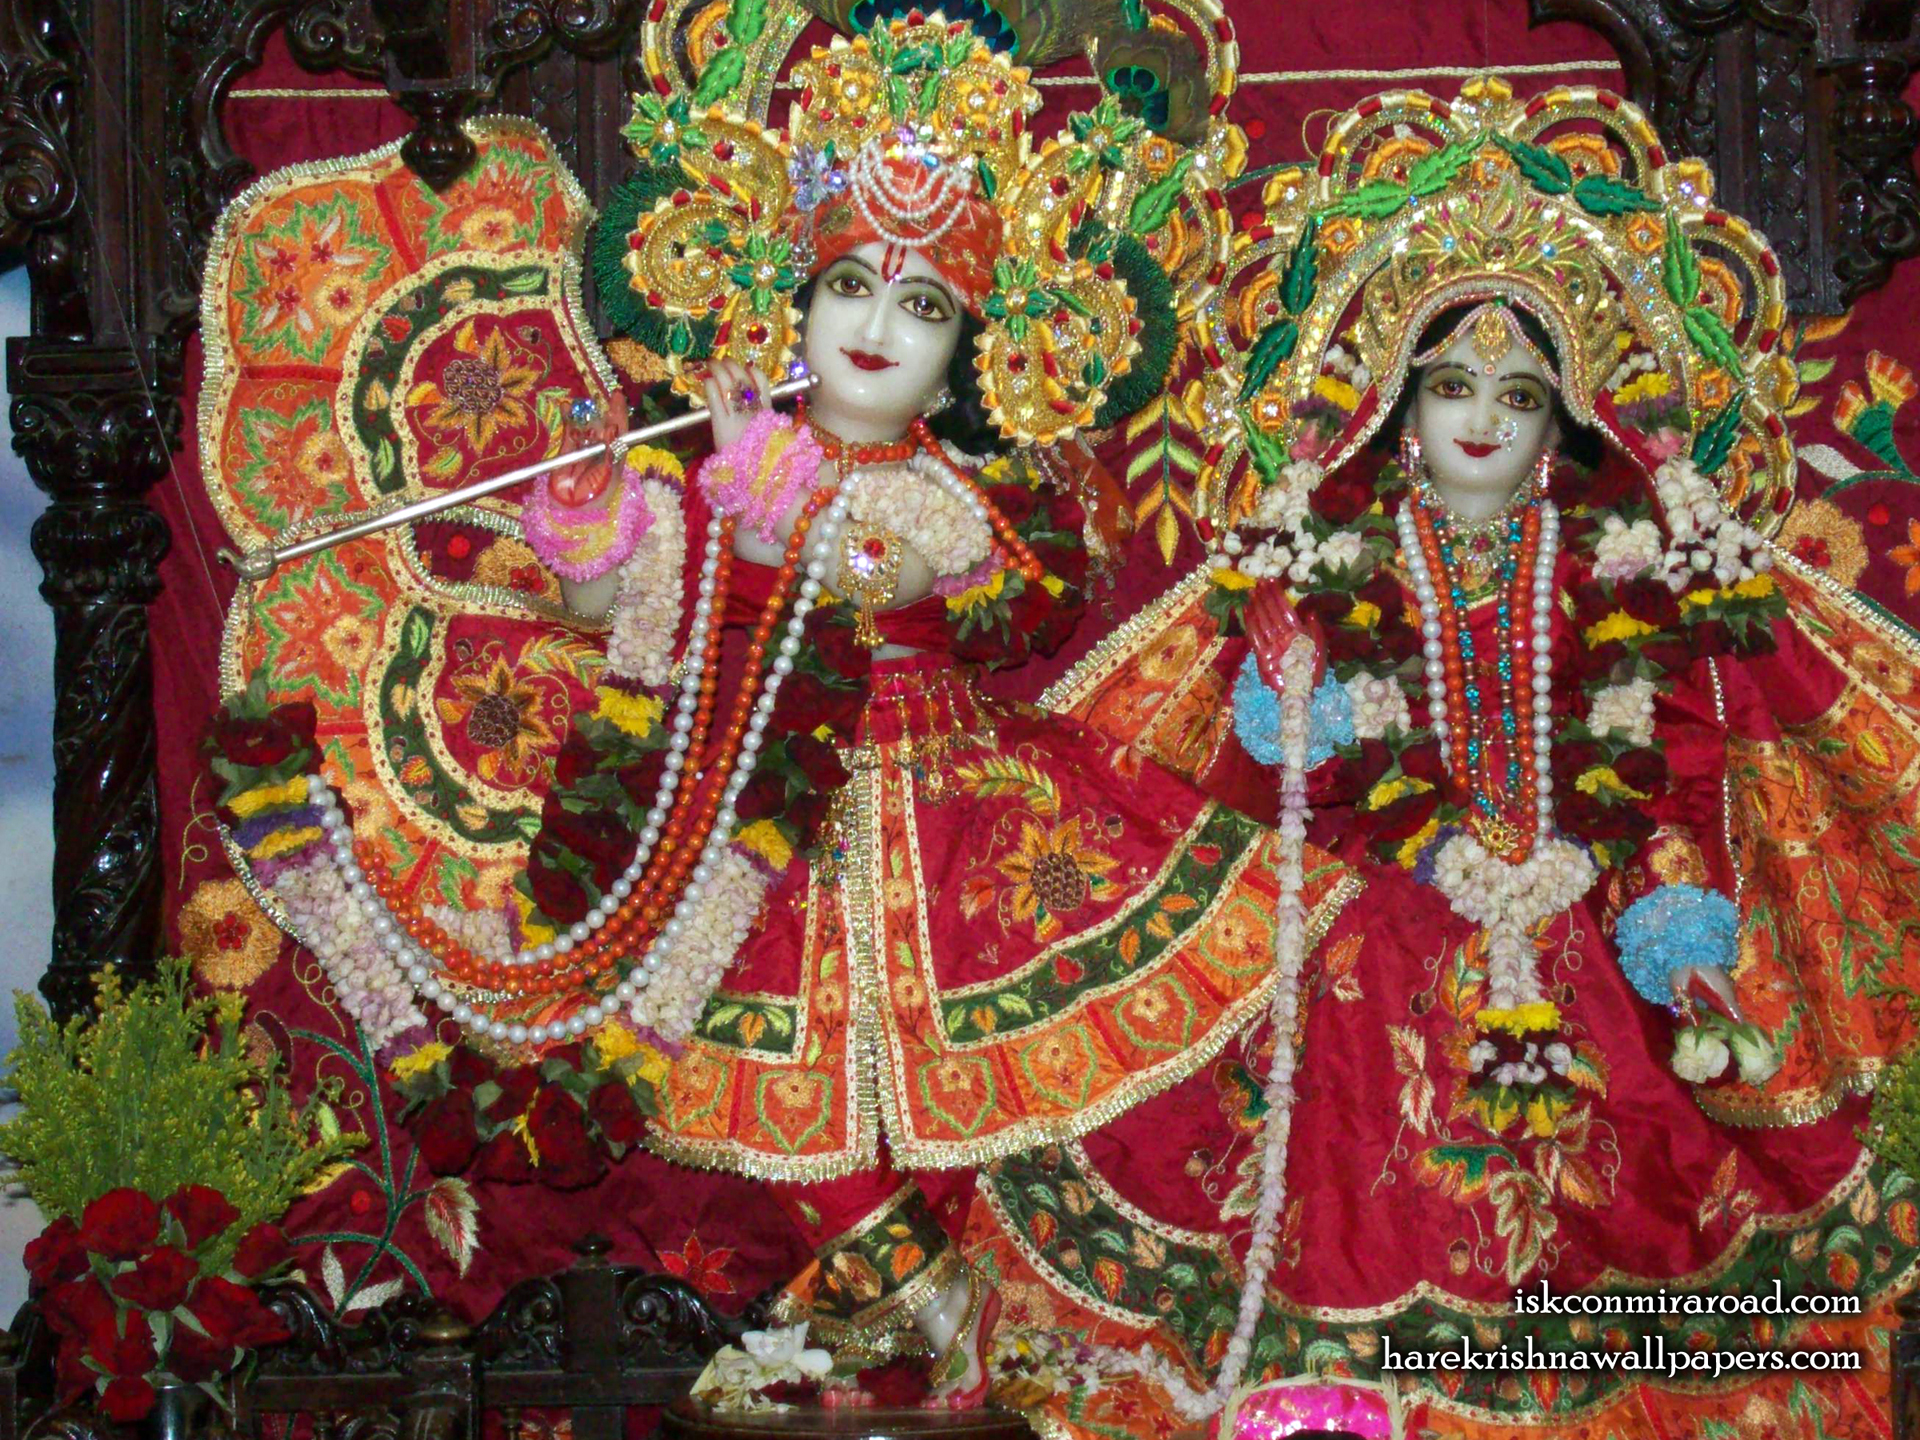 Sri Sri Radha Giridhari Wallpaper (014) Size 1920x1440 Download